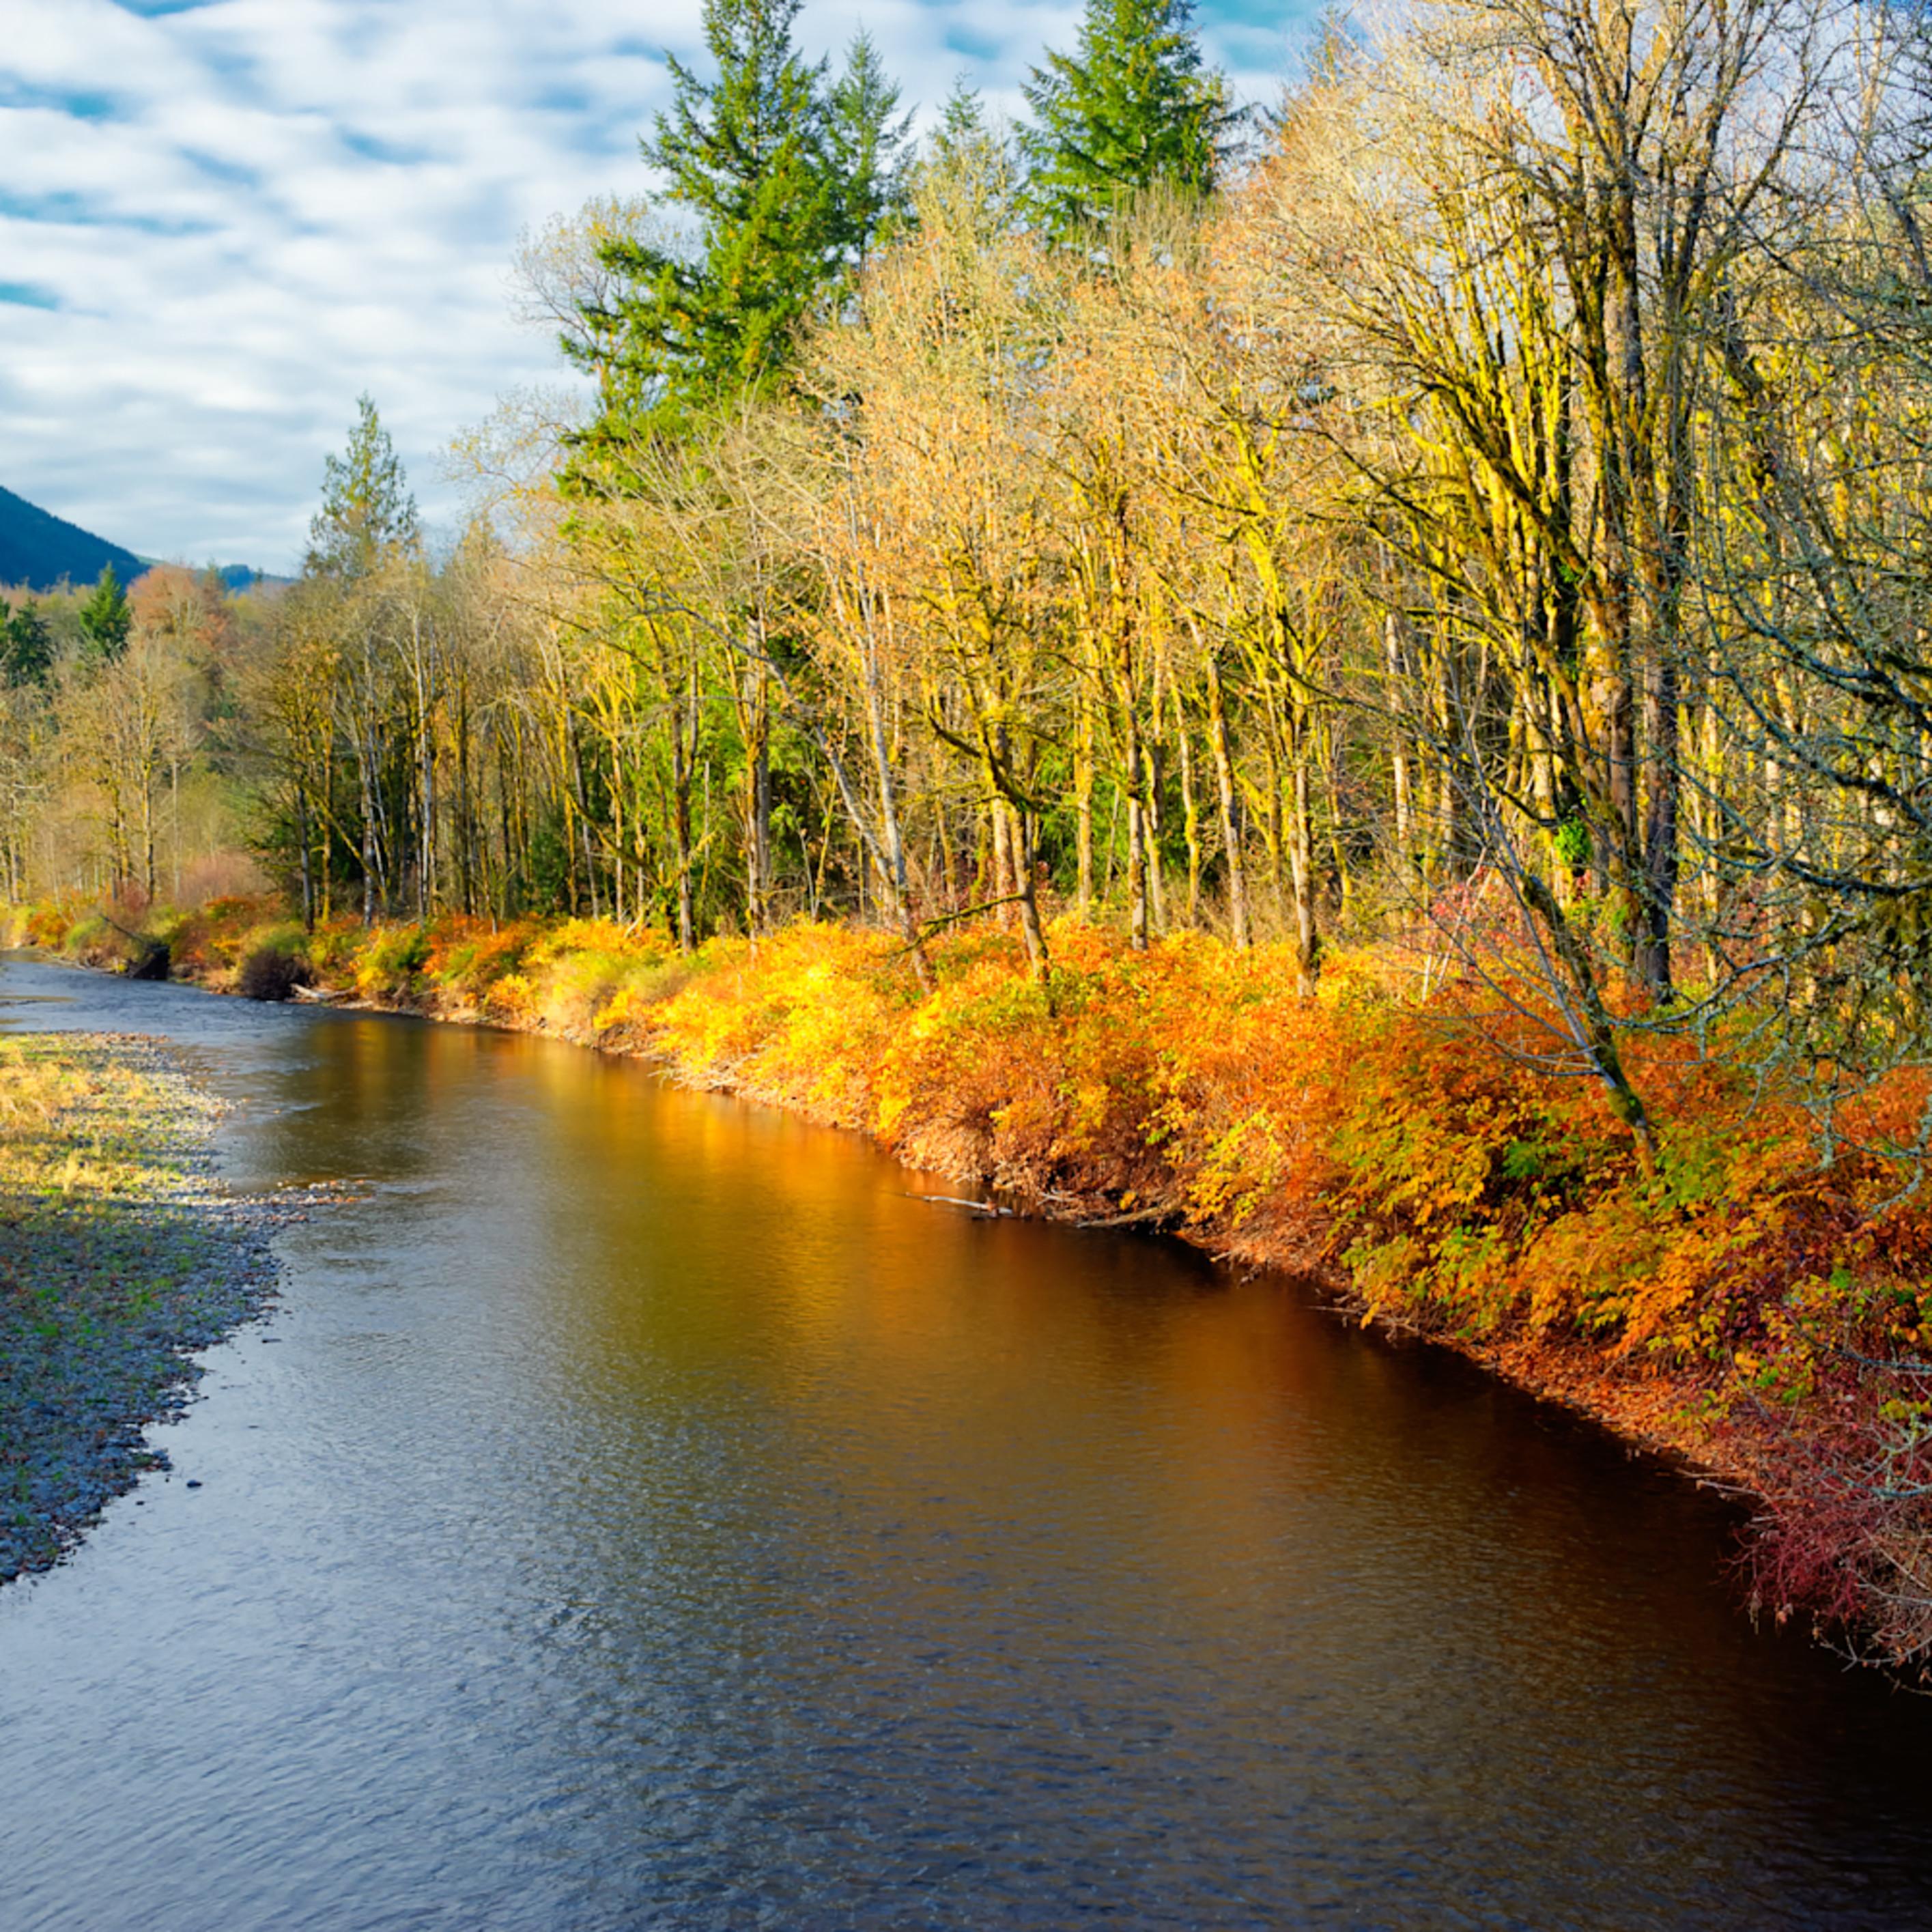 Late autumn colors tilton river wa november 2013 gh9vvg